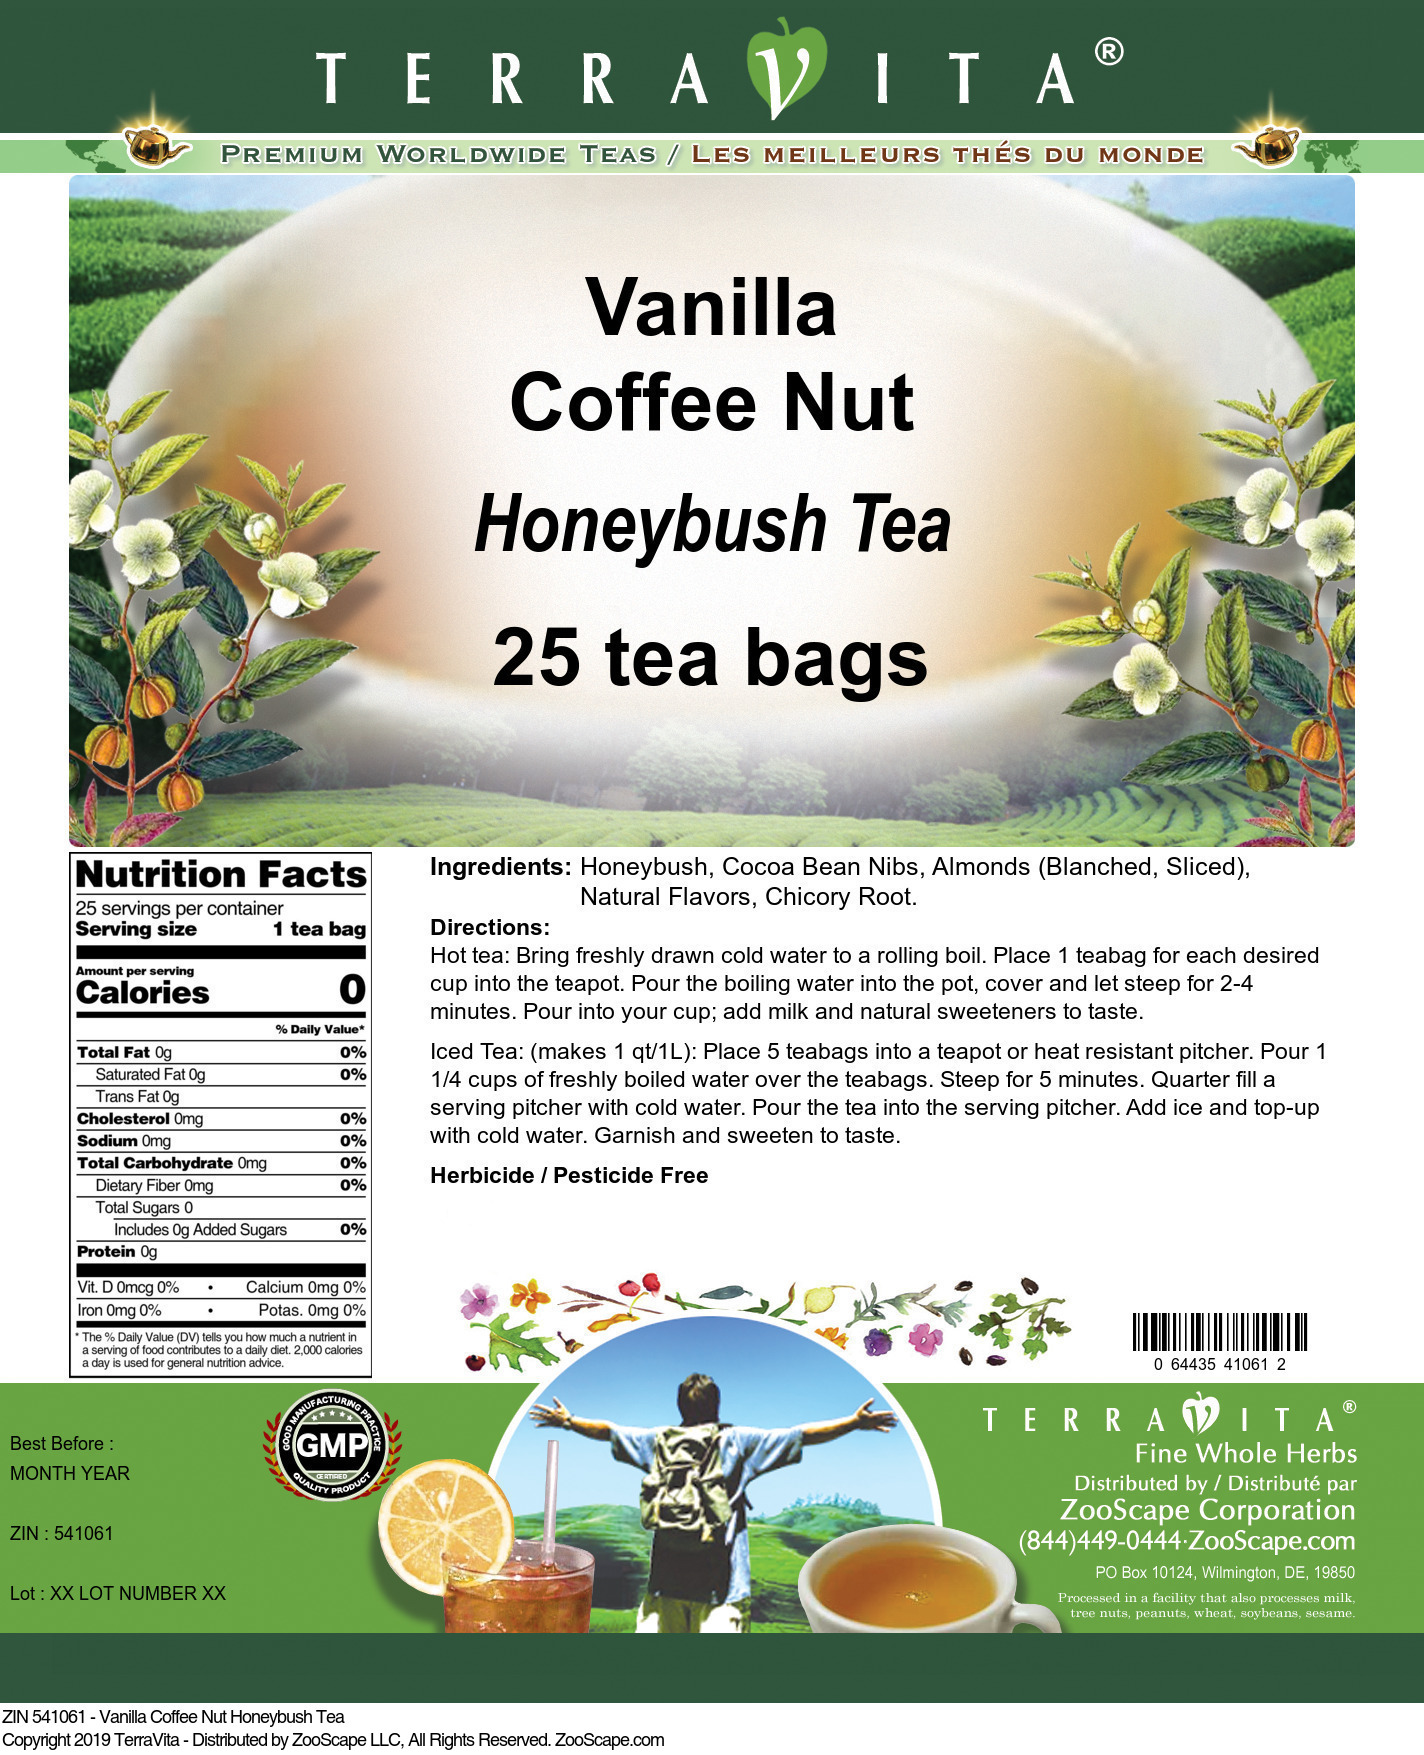 Vanilla Coffee Nut Honeybush Tea